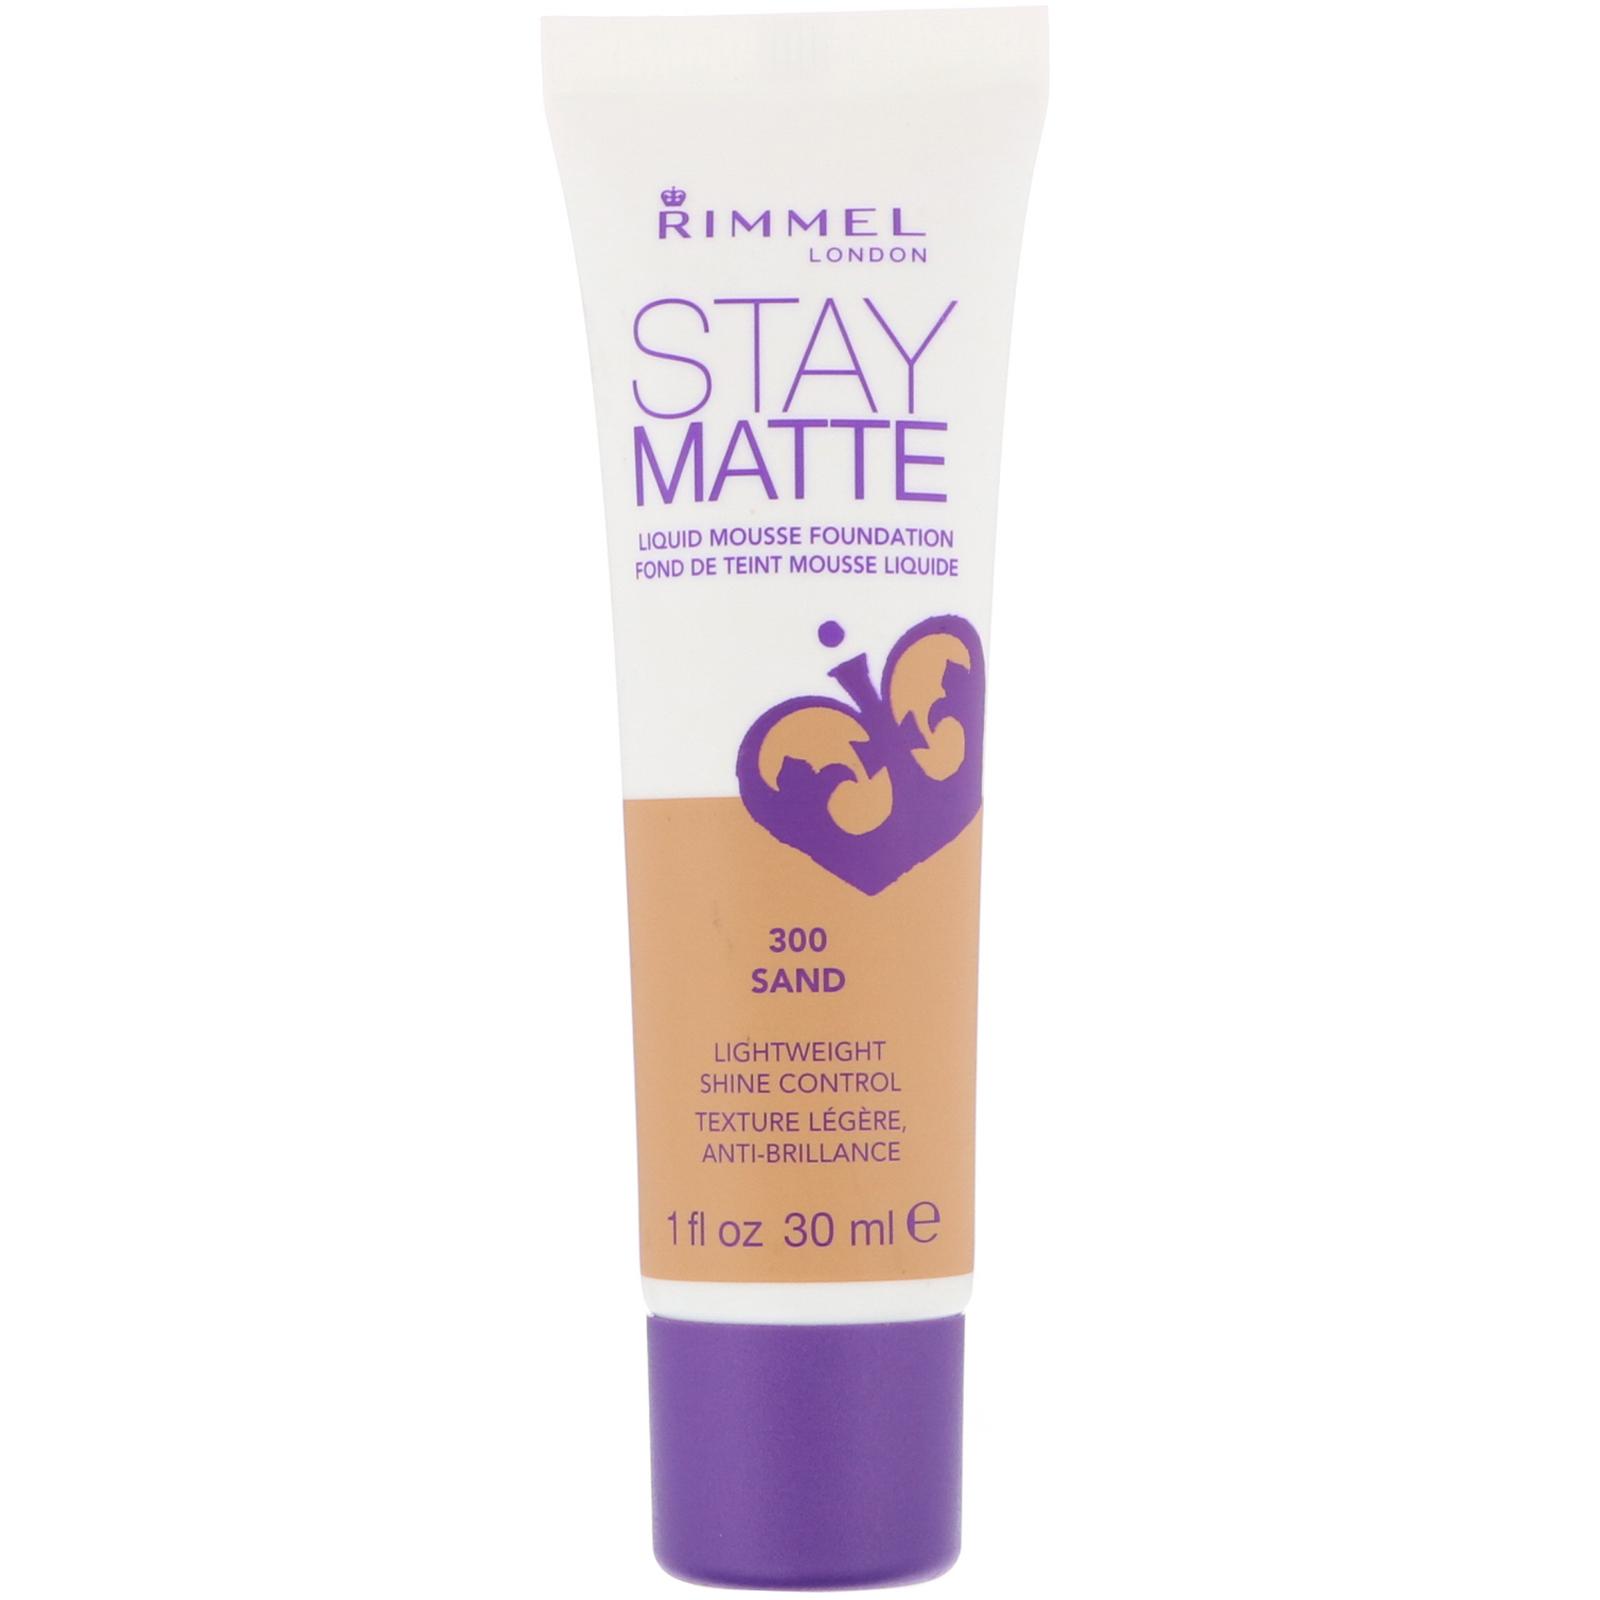 Rimmel London Stay Matte Liquid Mousse Foundation 300 Sand 1 Fl Oz 30 Ml Iherb